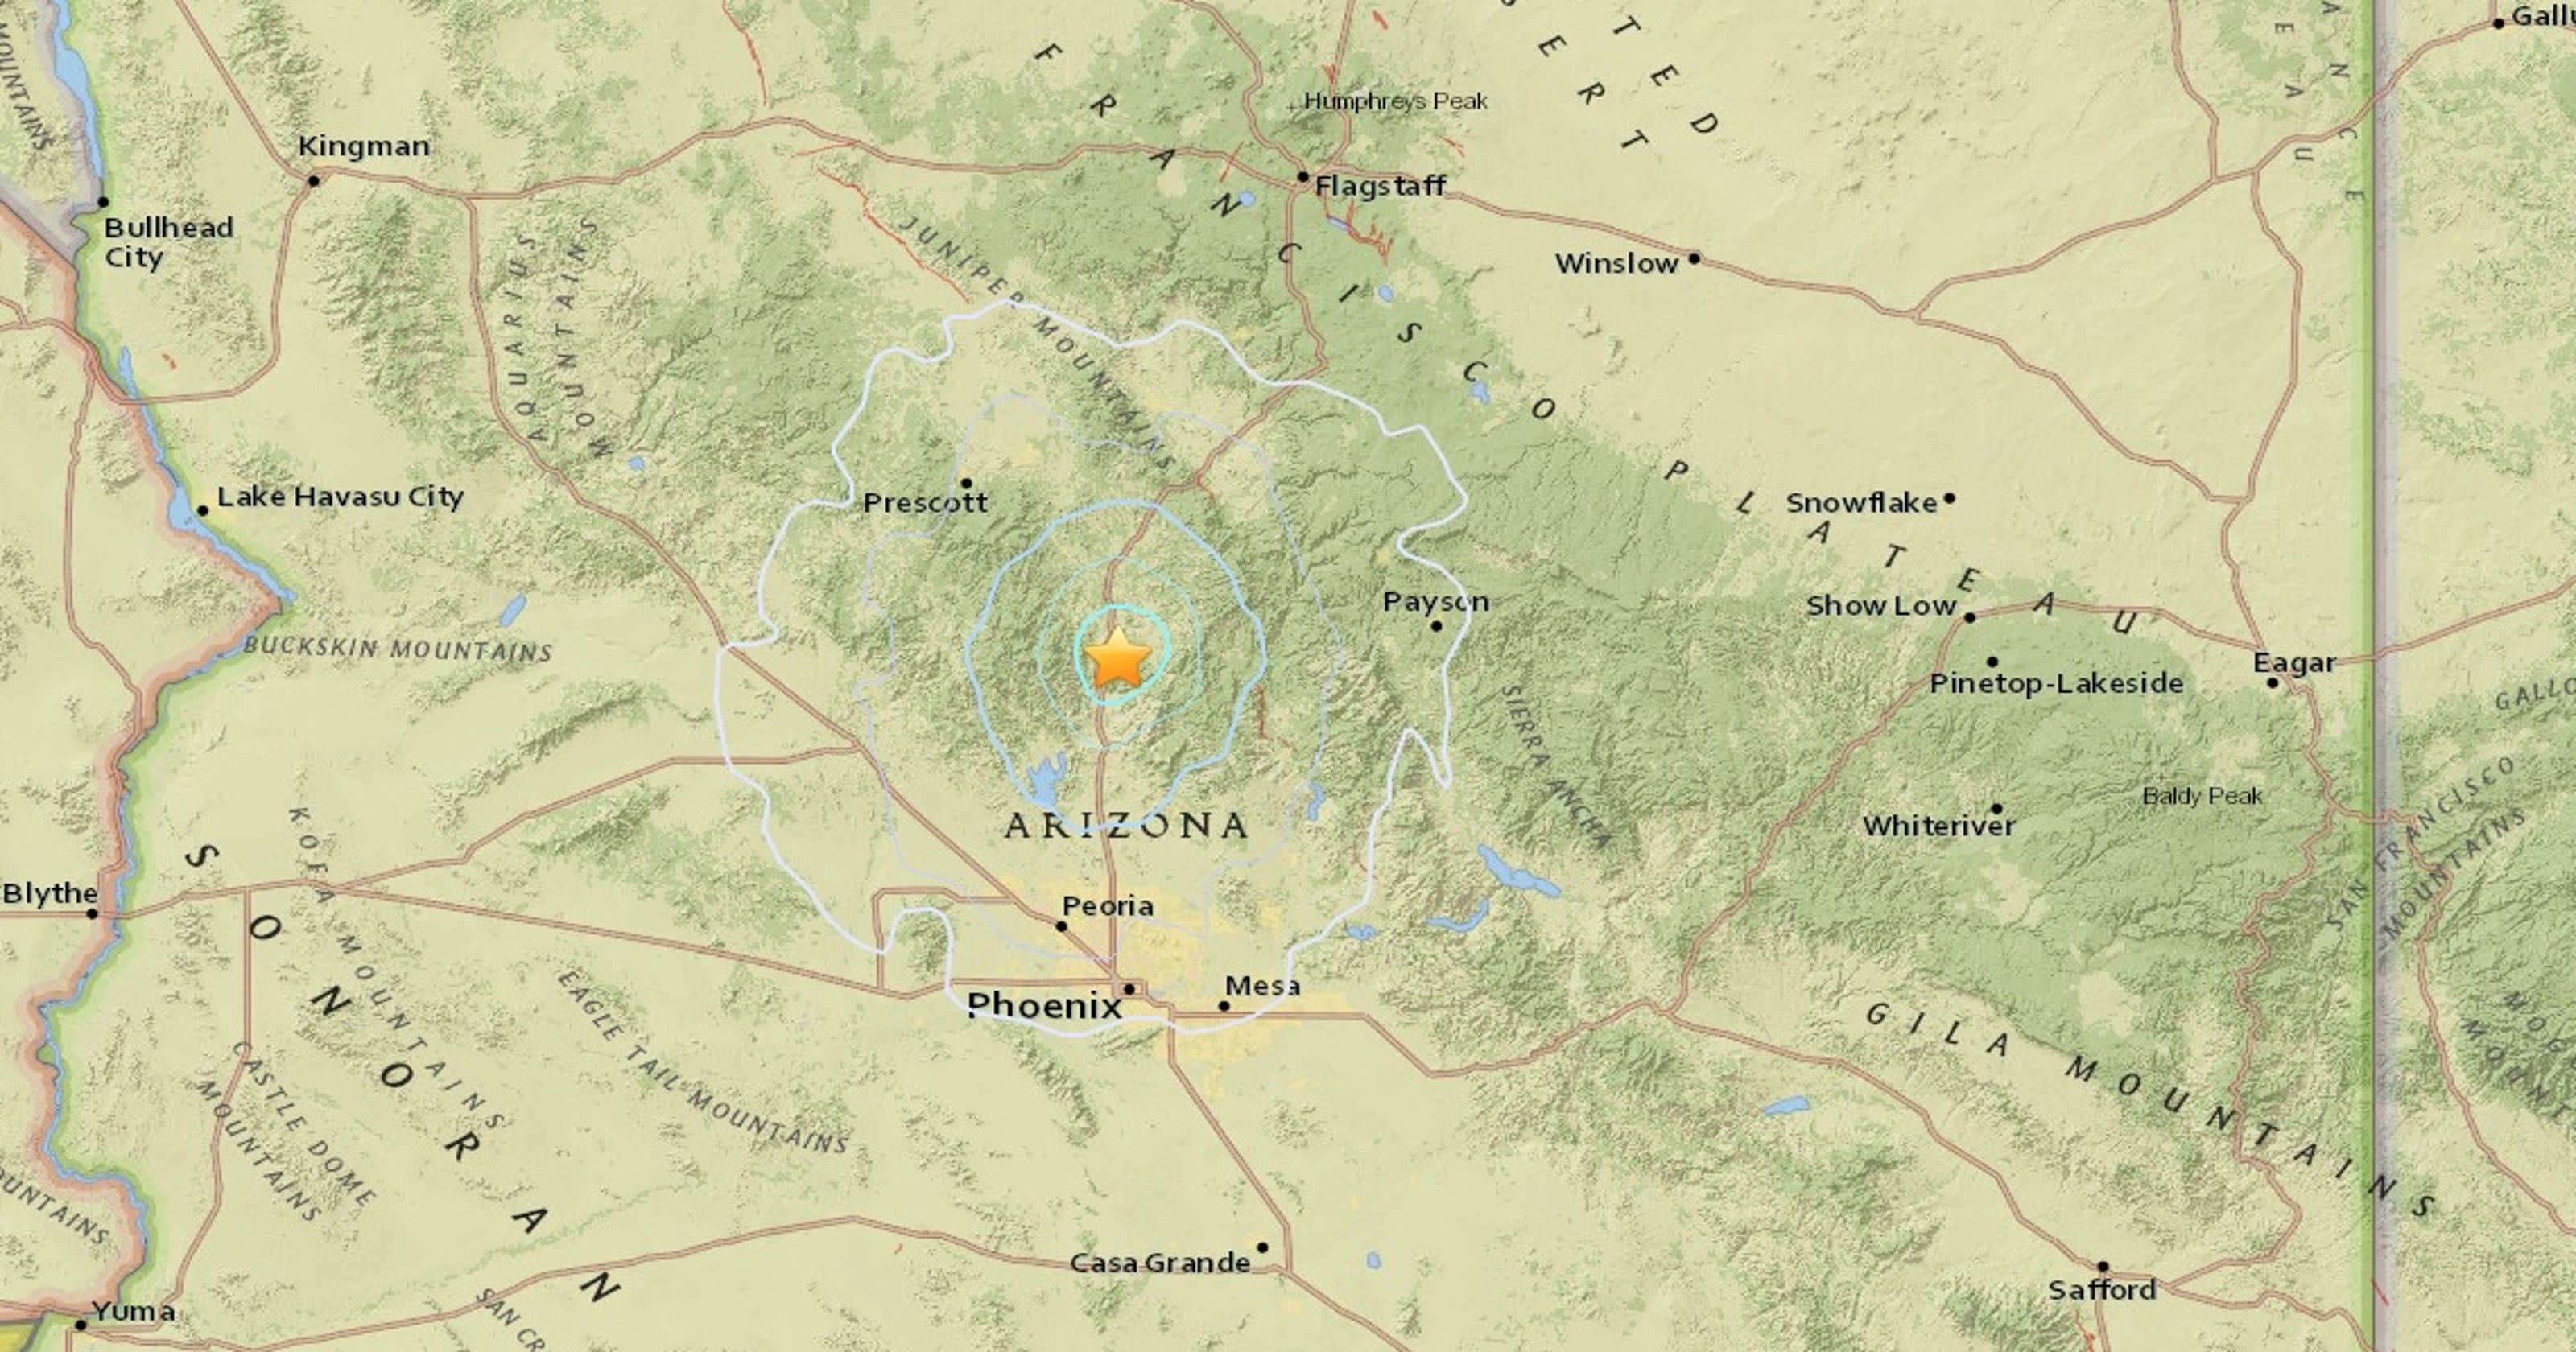 Map Of Arizona Fault Lines.4 1 Magnitude Arizona Earthquake Shakes Metro Phoenix